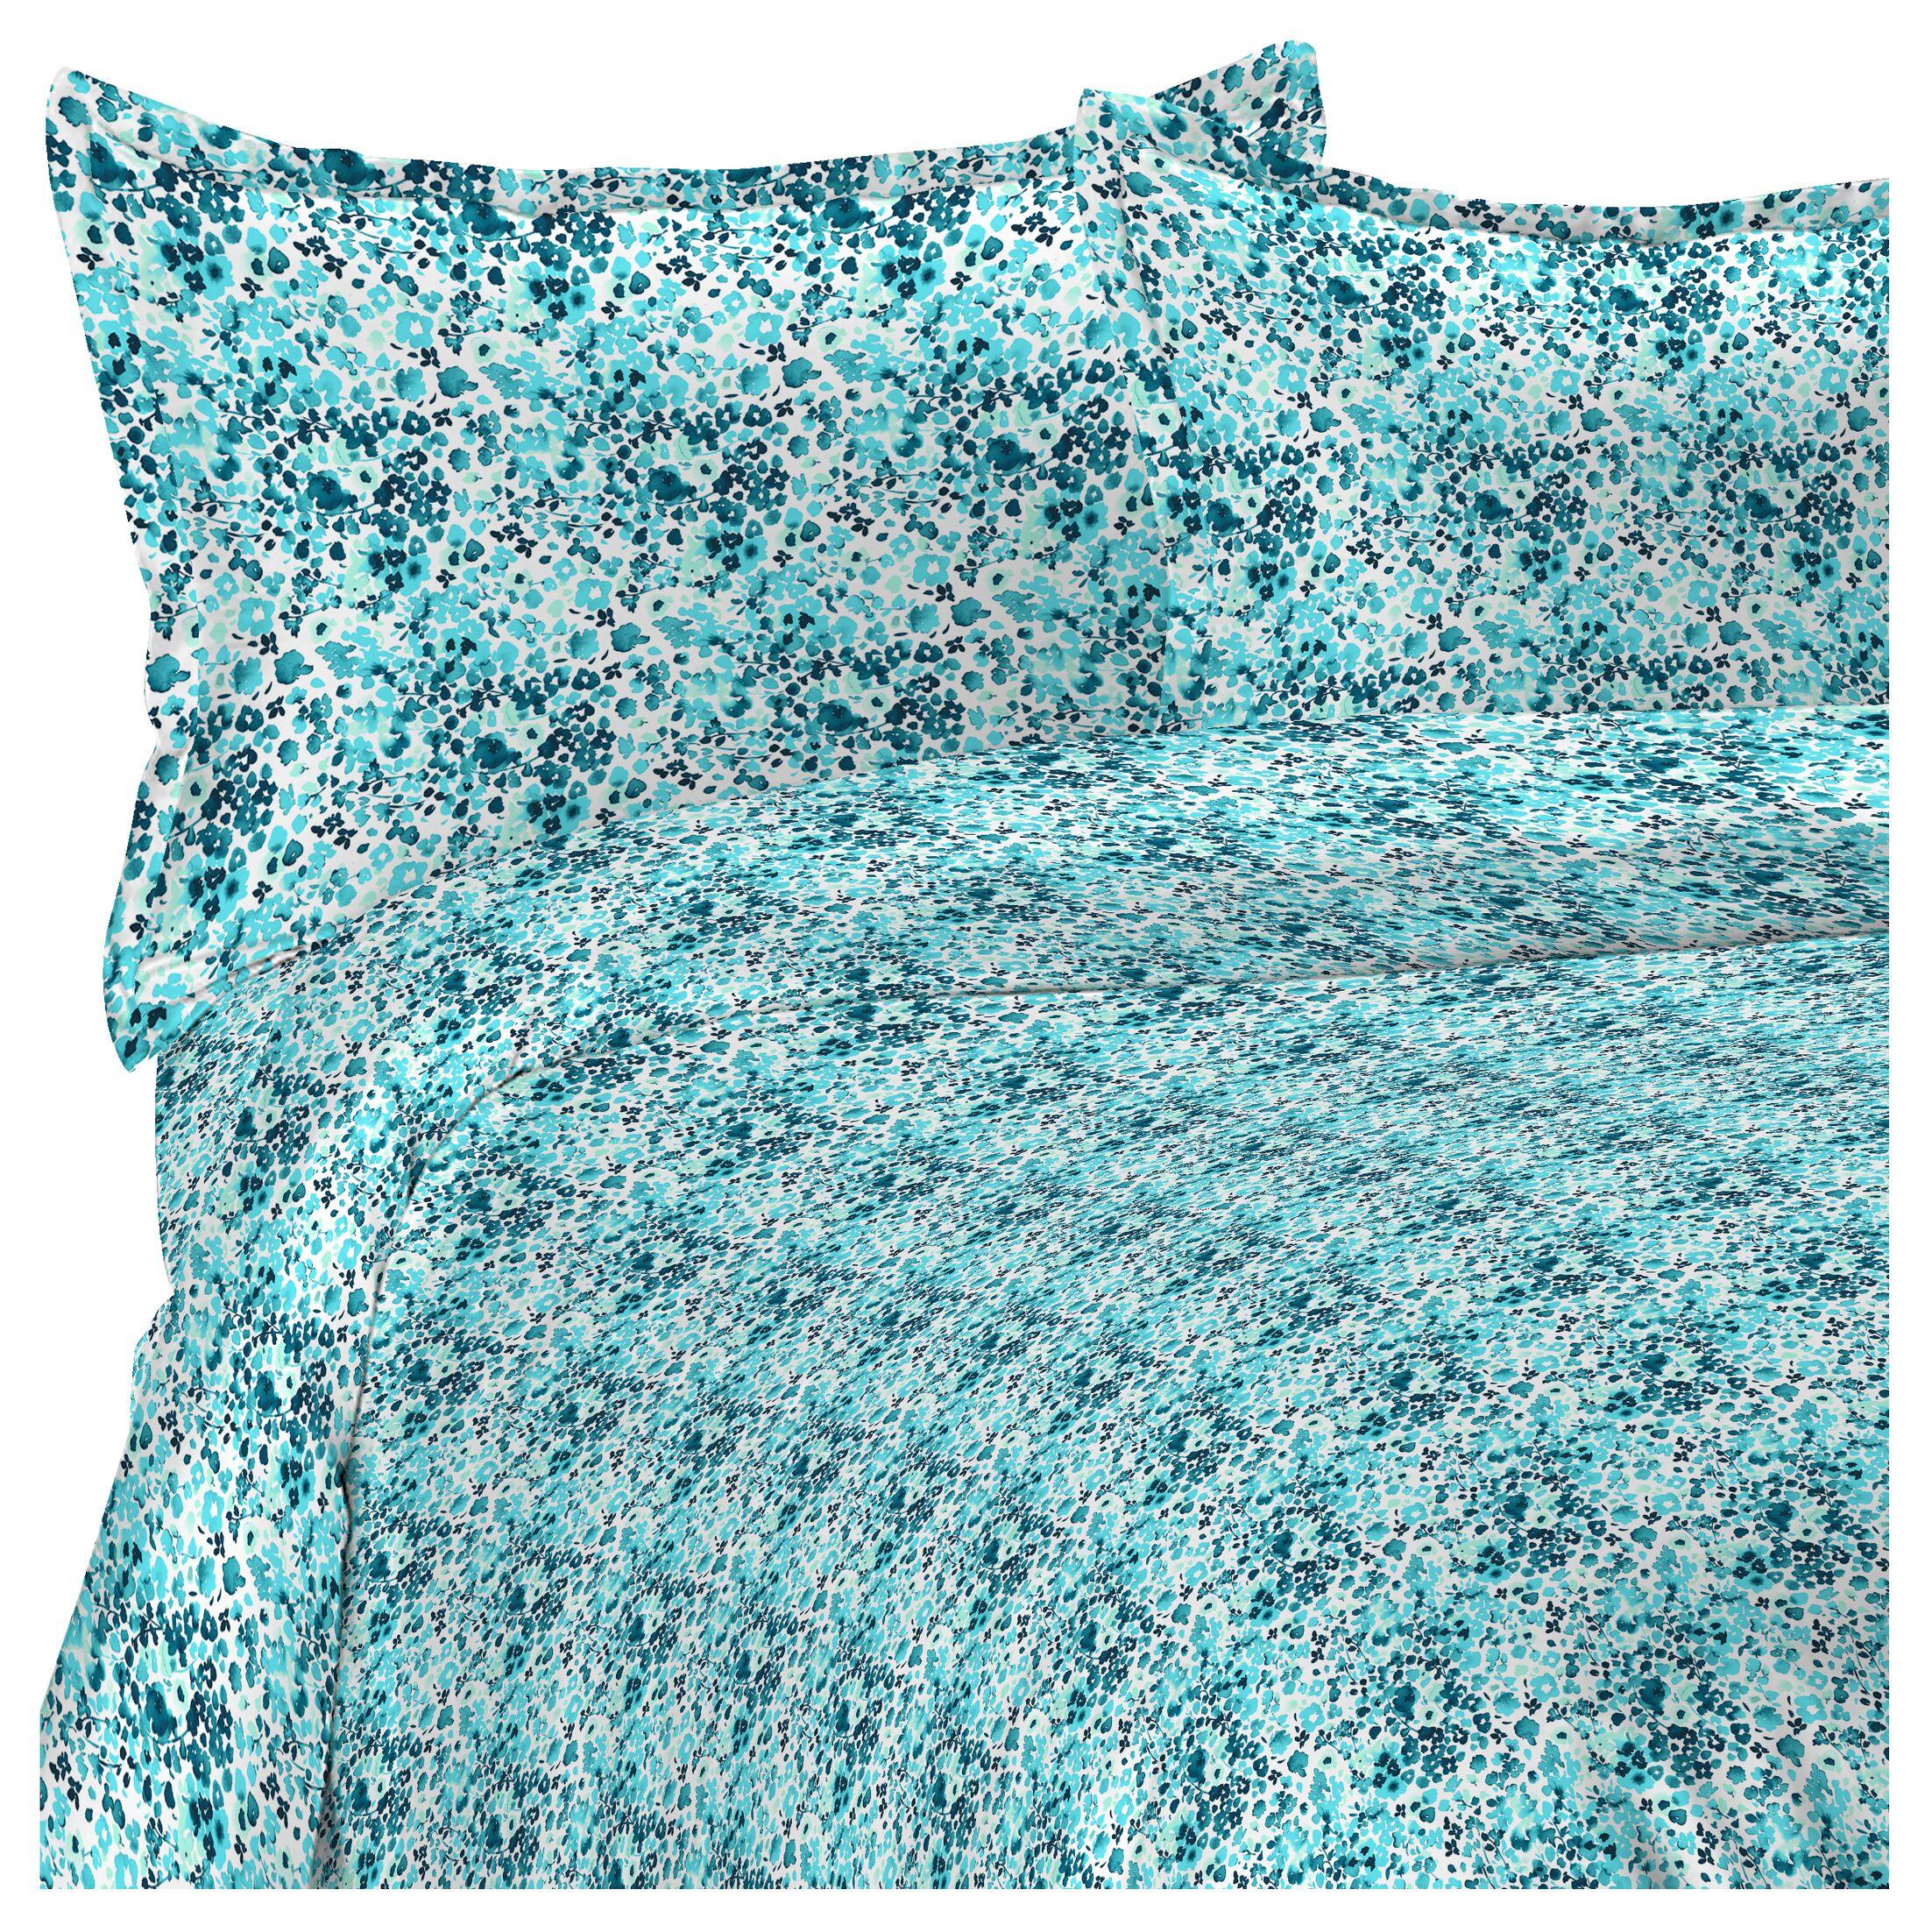 Hurton 400 Thread Count 100% Cotton Sheet Set Size: Twin